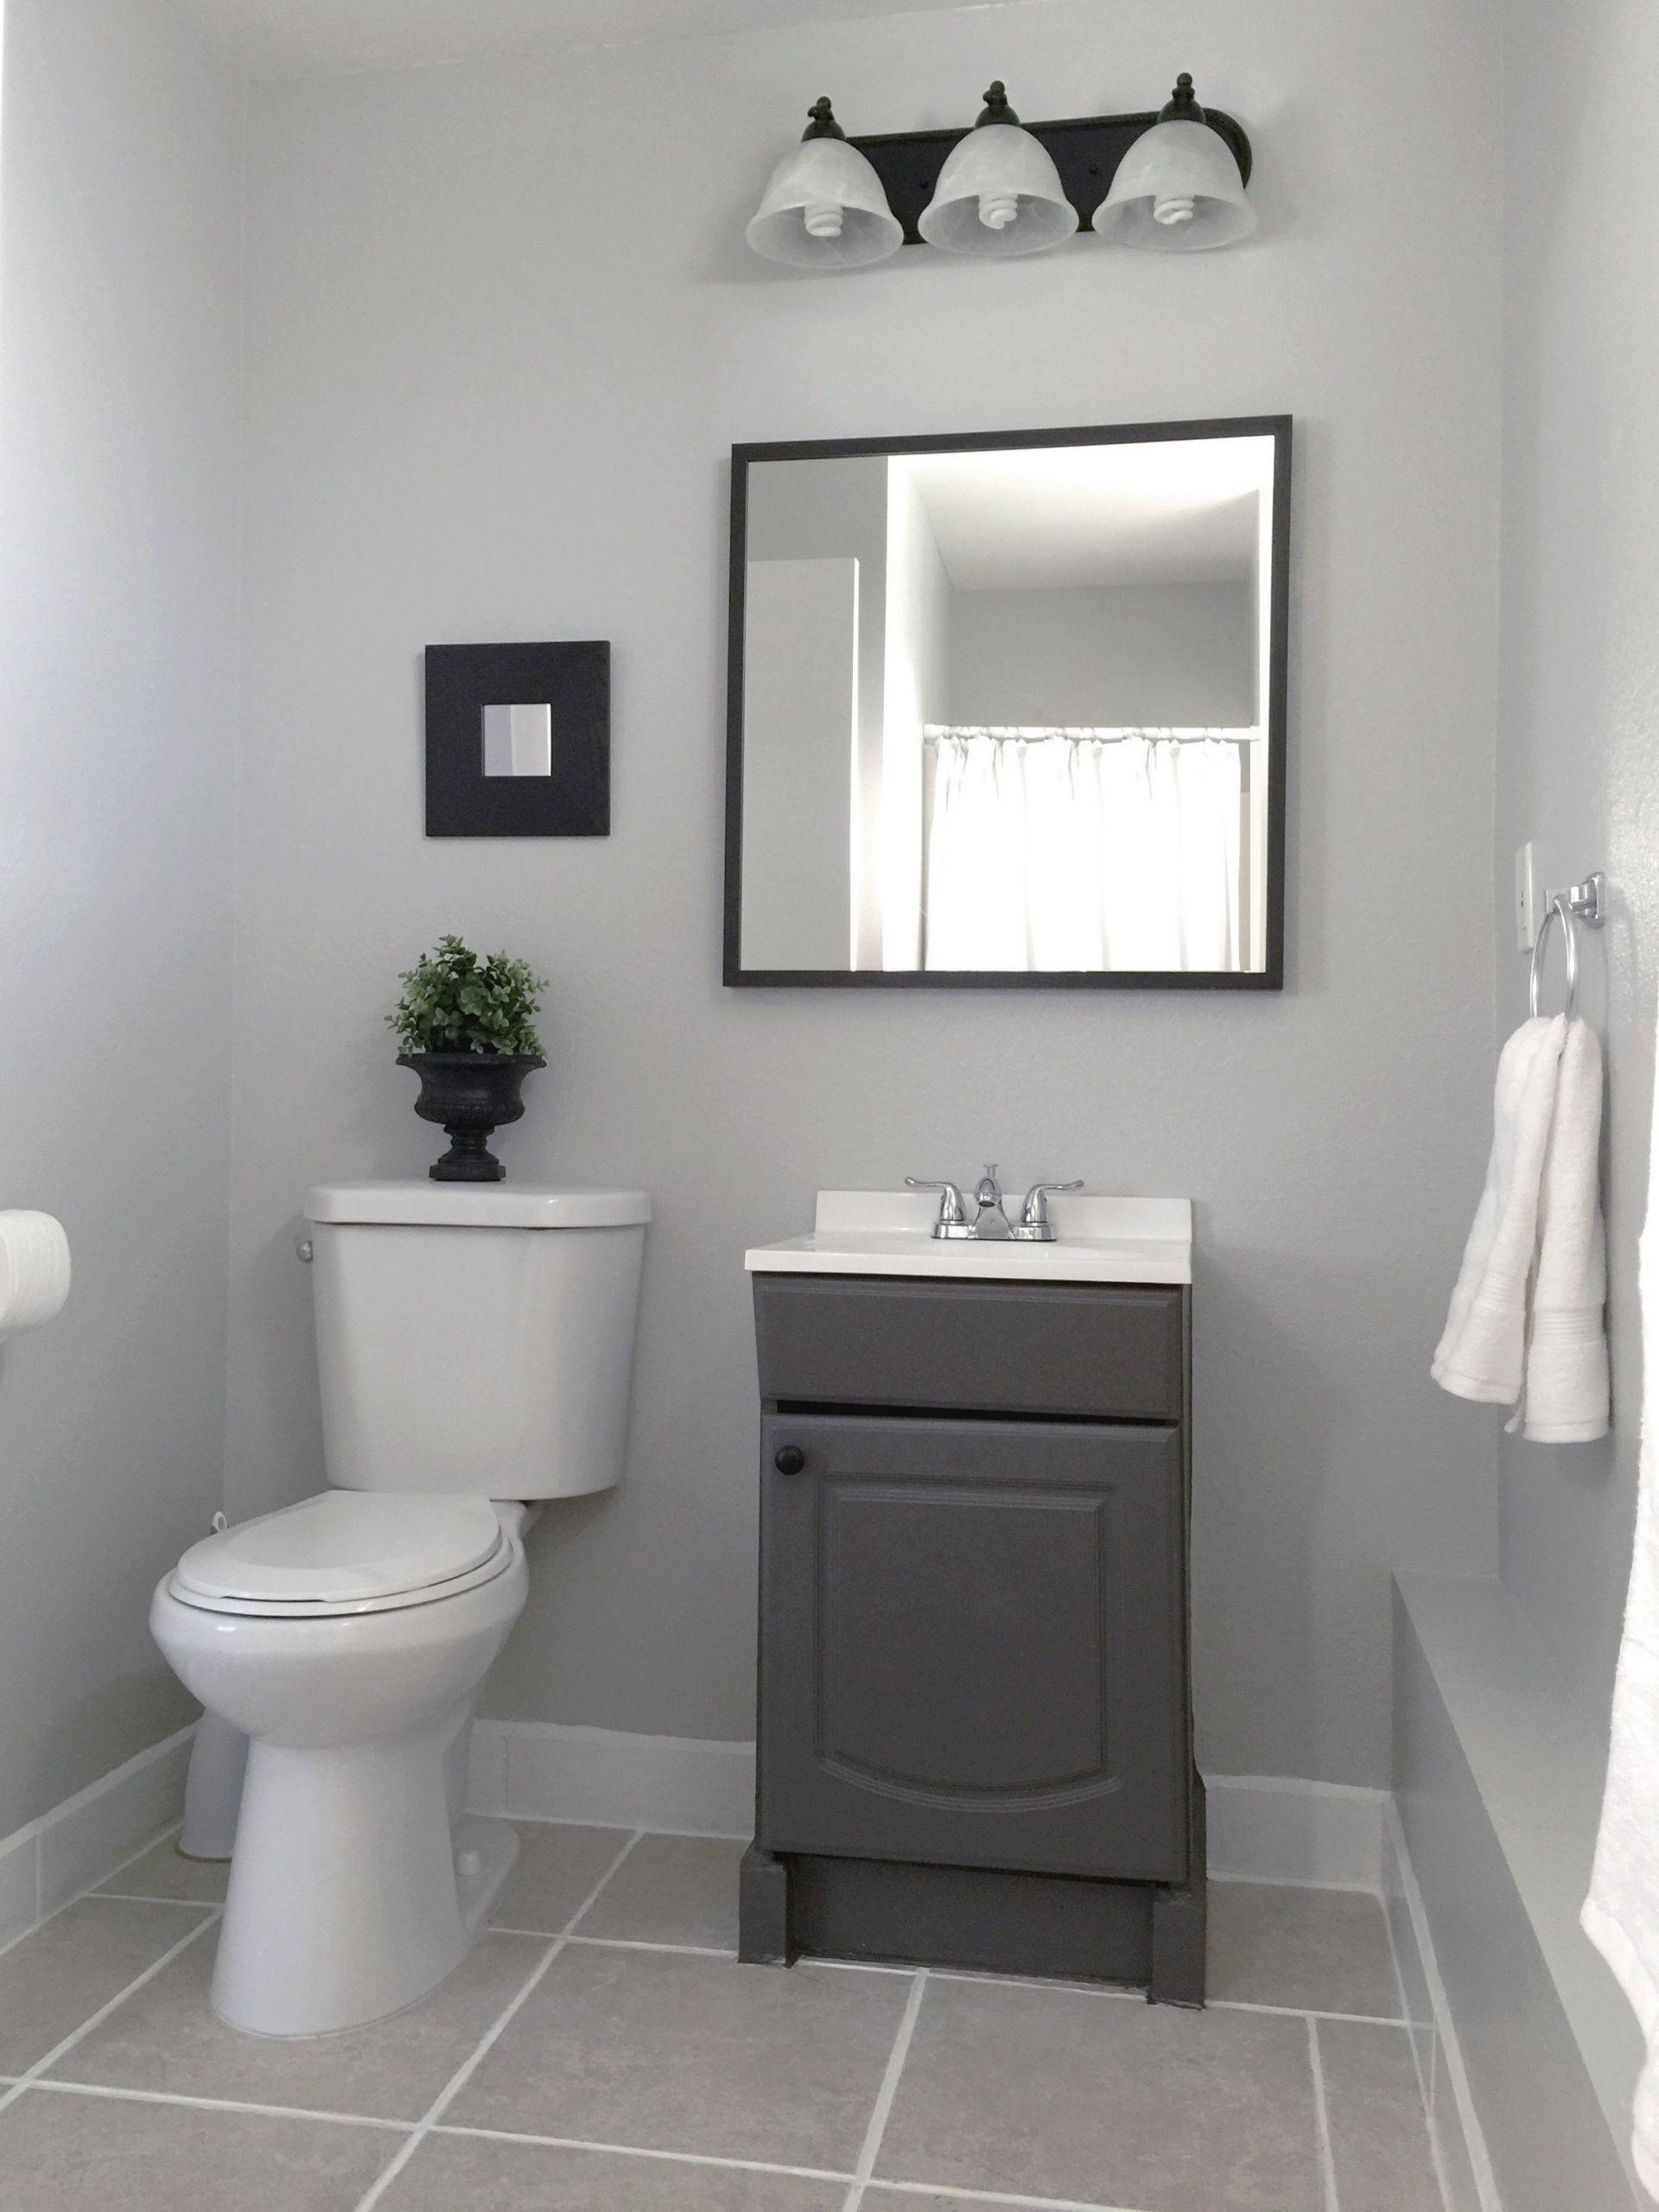 Grey Paint Colors For Bathroom  25 Beautiful Bathroom Color Scheme Ideas for Small